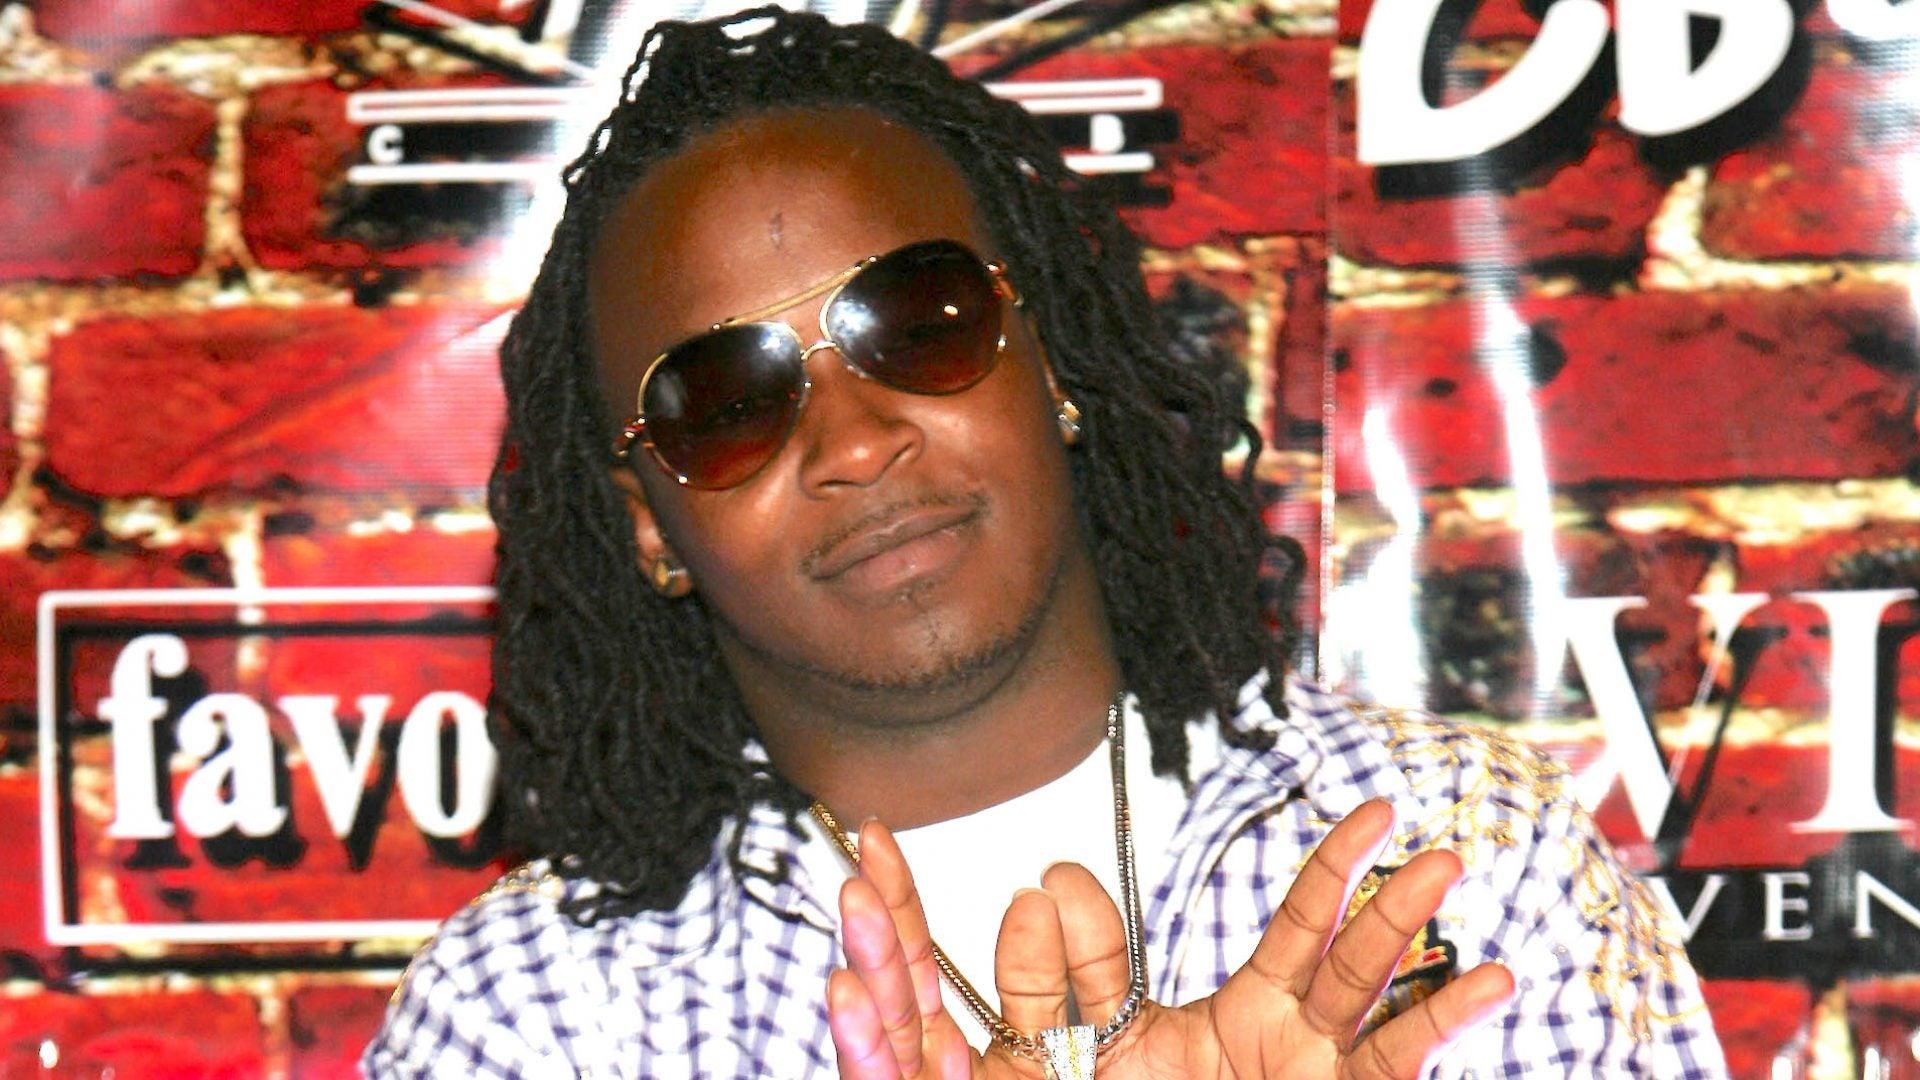 St. Louis Rapper Huey Dead At 32